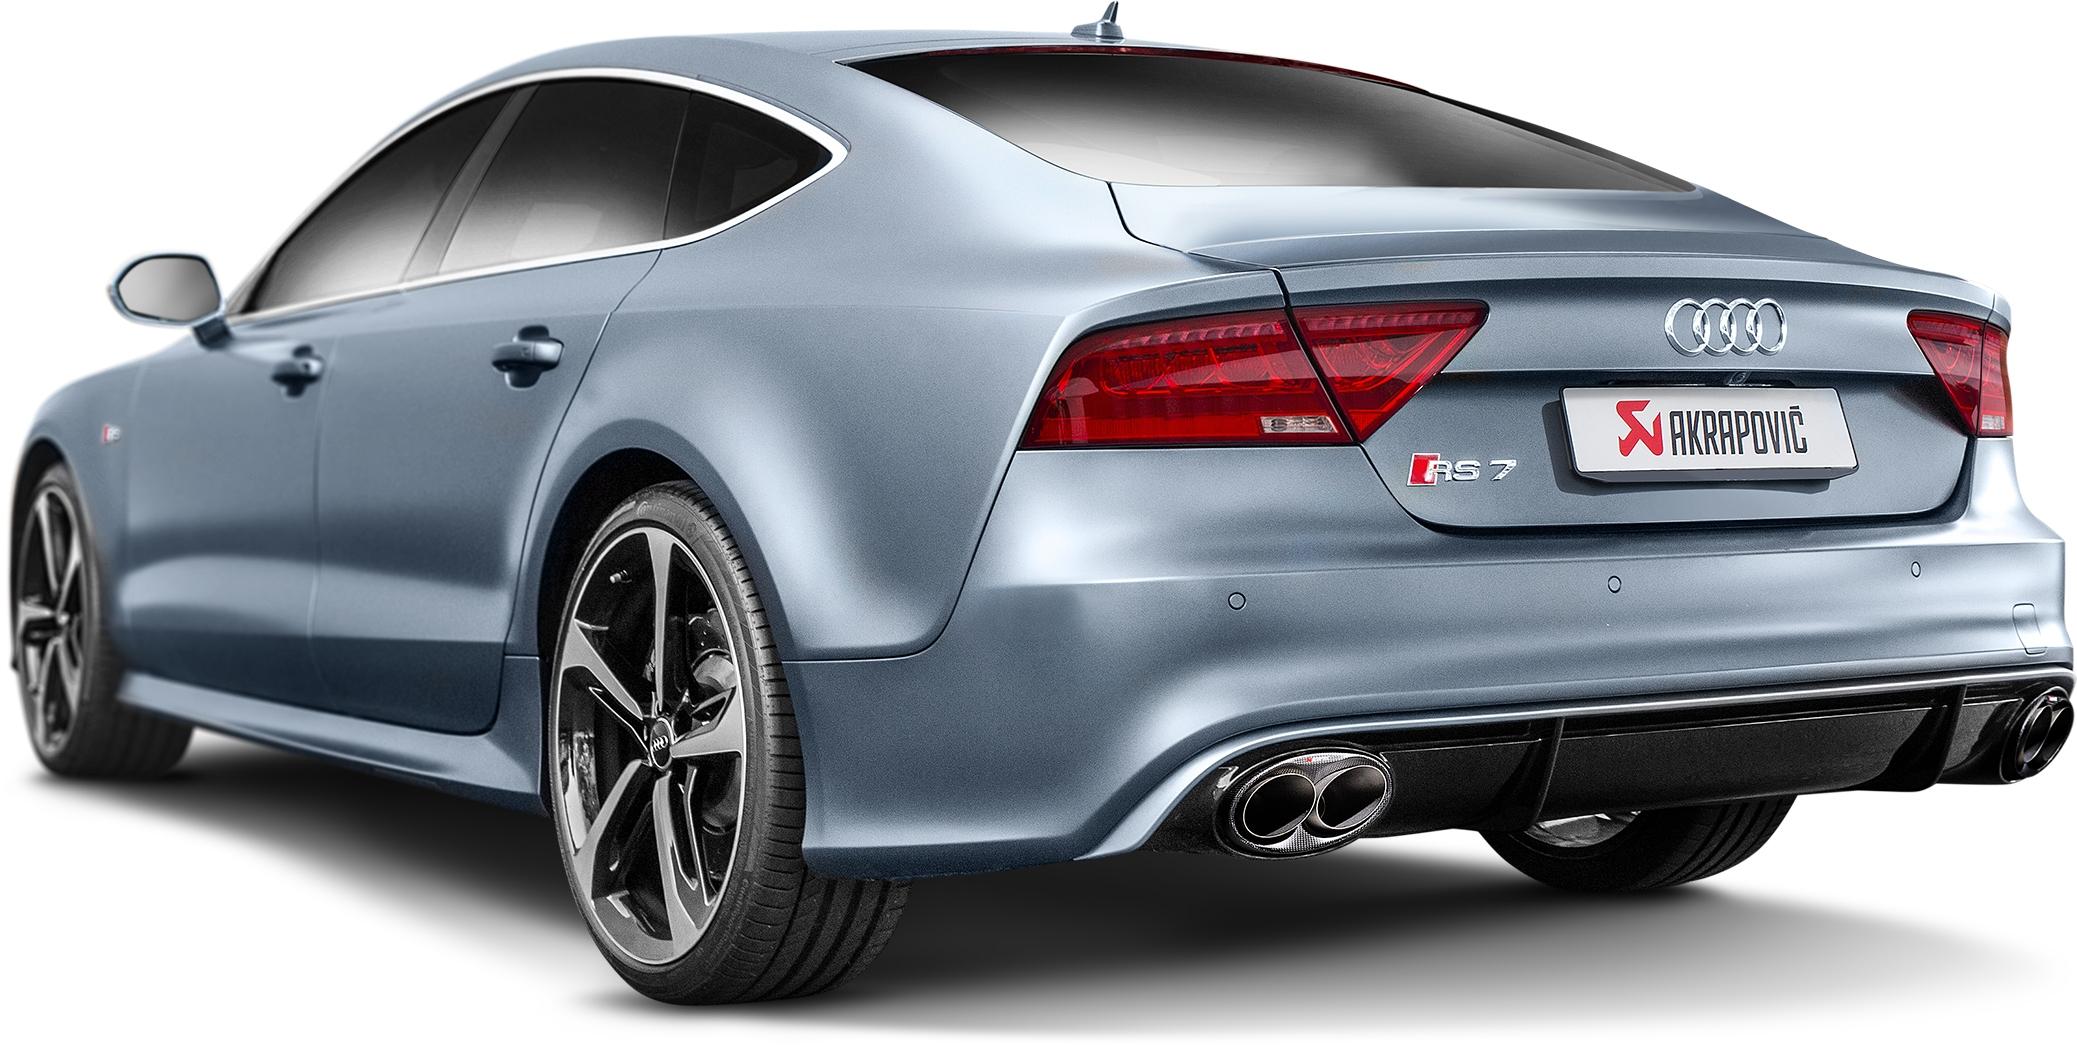 Audi RS7 Akrapovic Exhaust IN STOCK NOW!